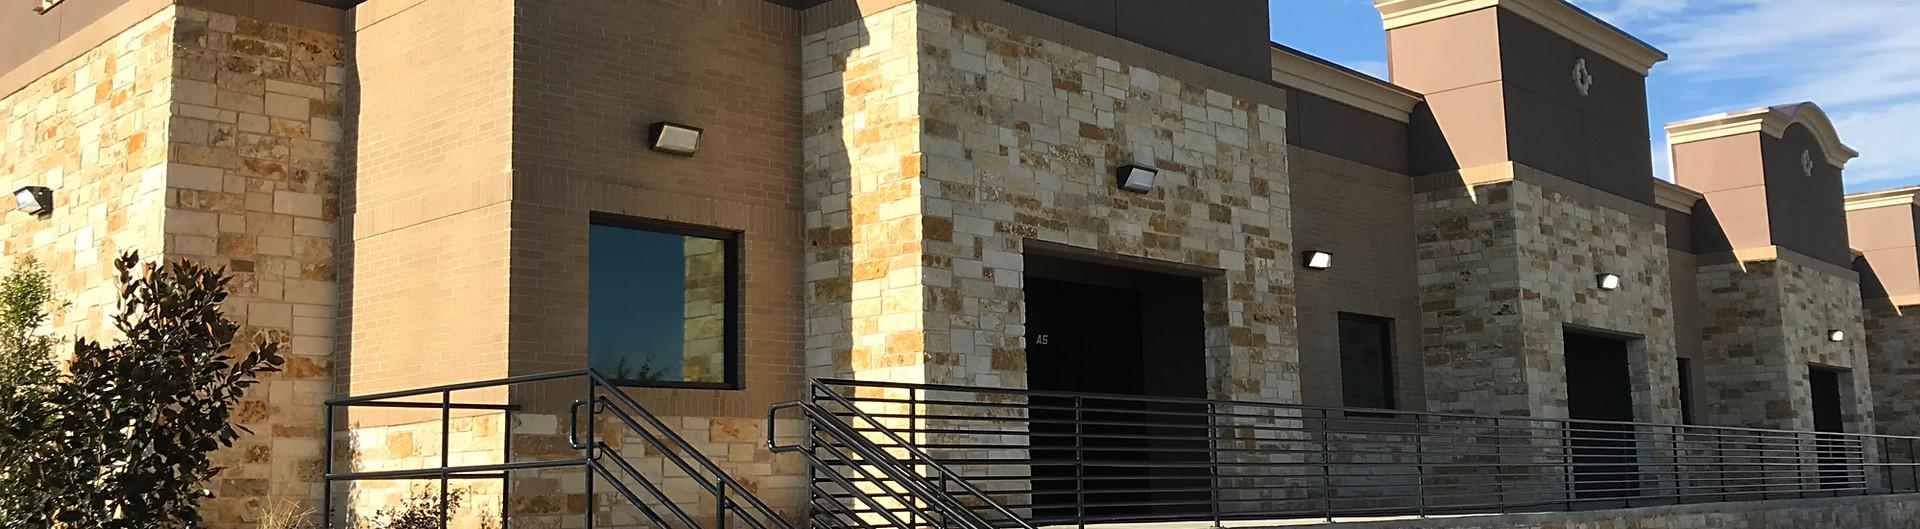 Office Building, Rockwall, TX